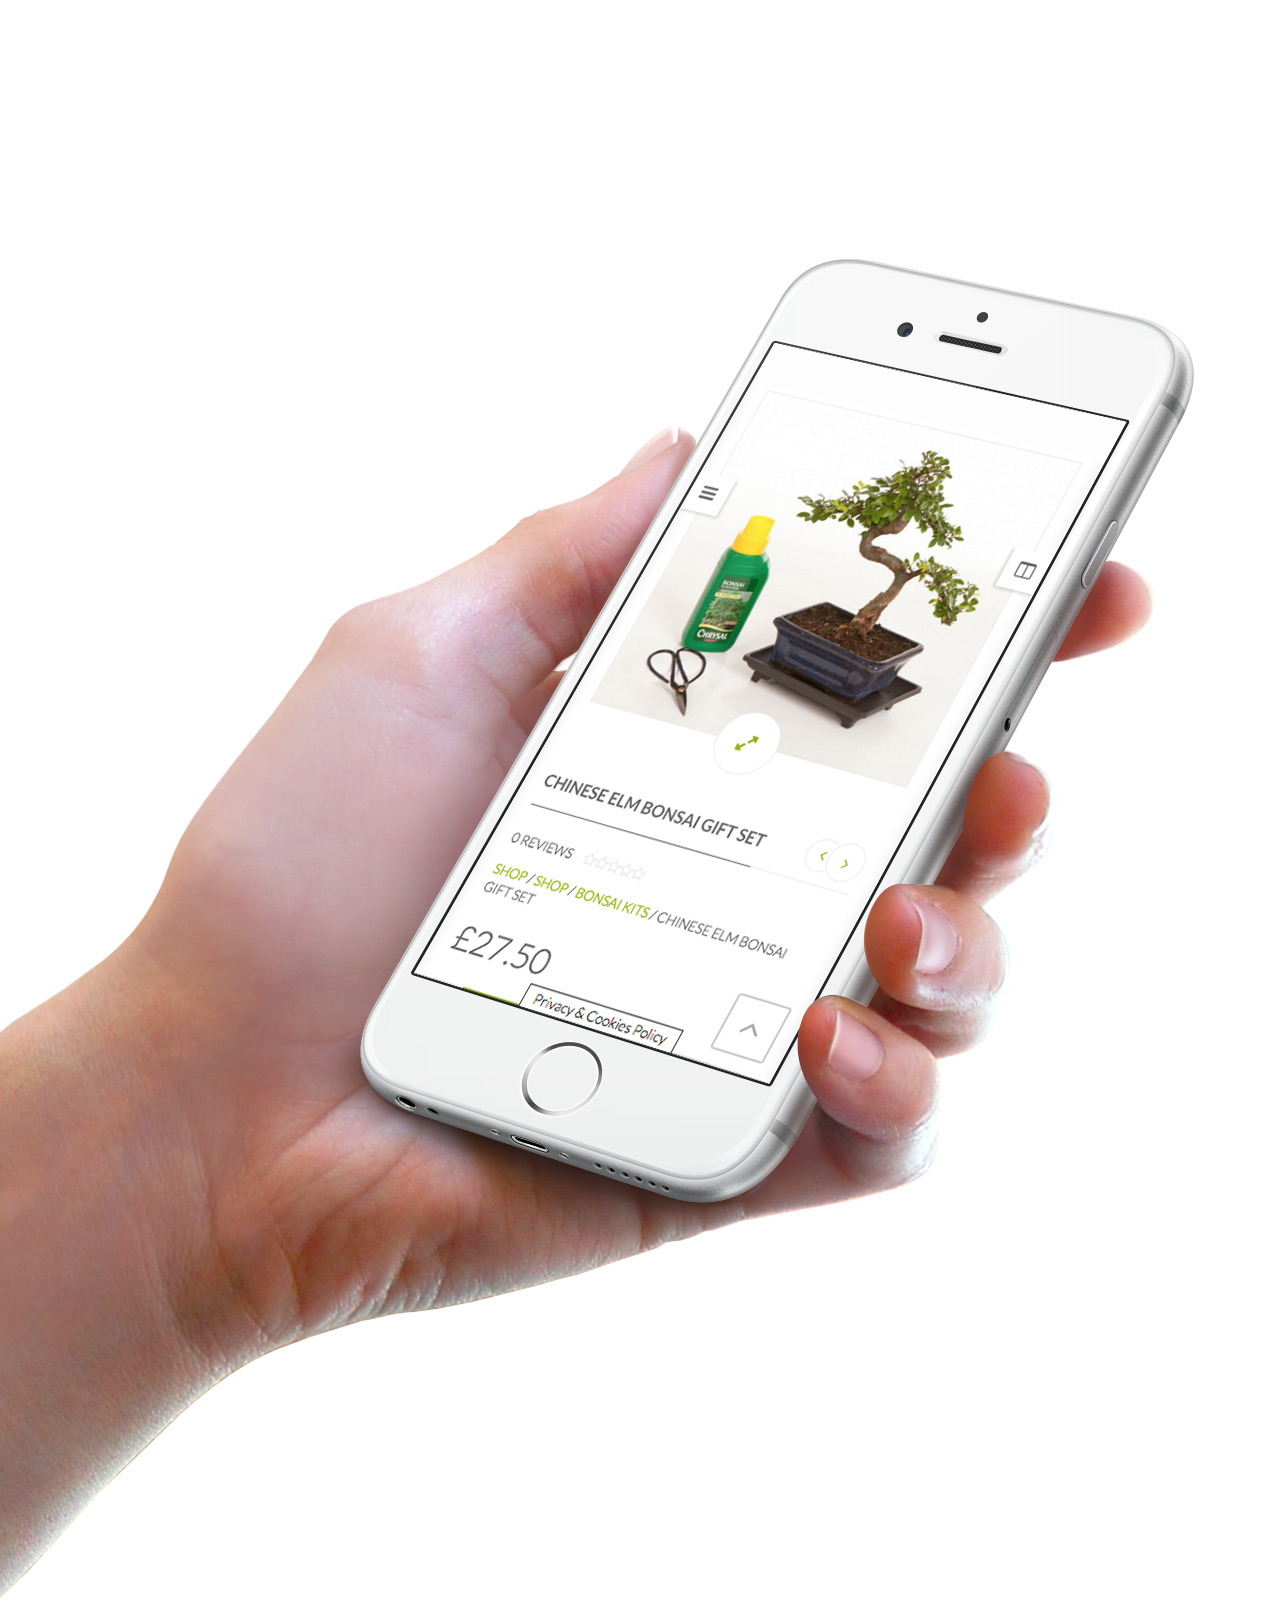 apple iphone all things bonsai website design responsive example sheffield website designer ideauk